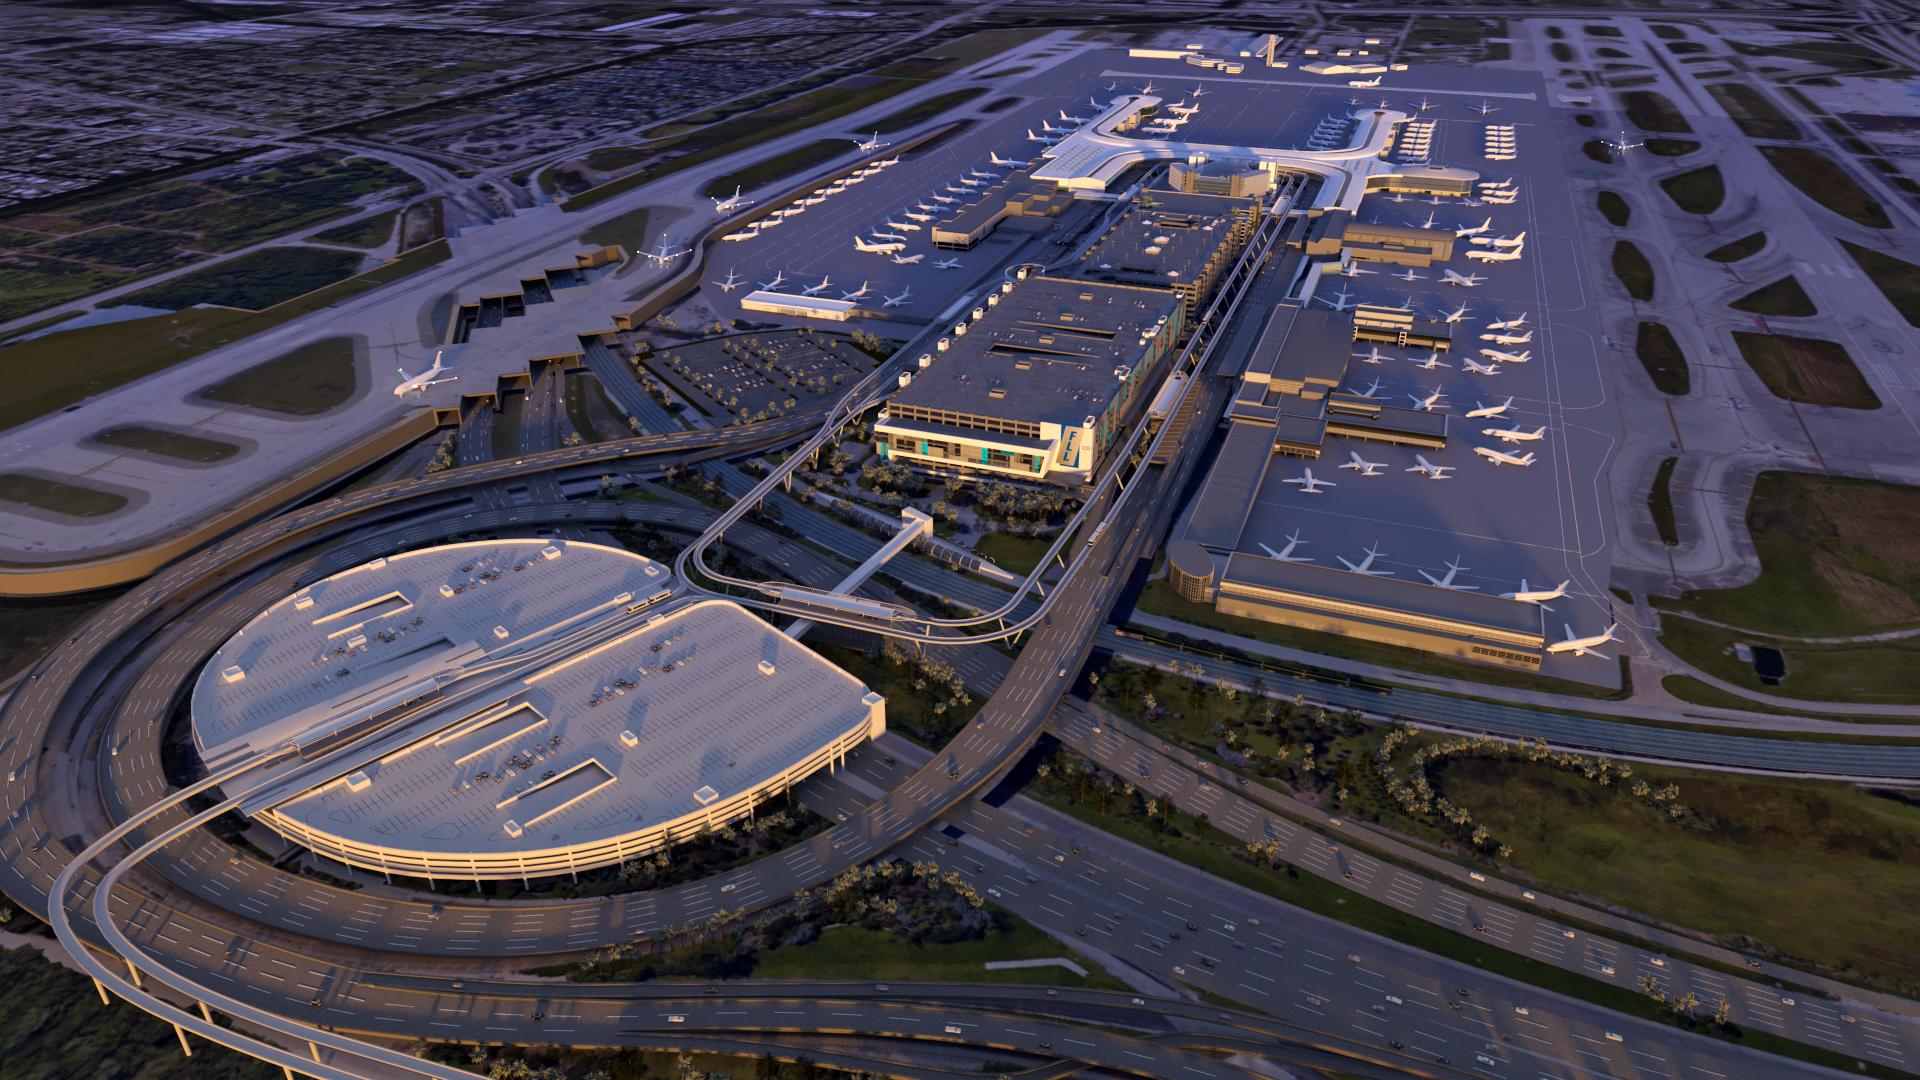 FLL international airport - 3D Modeling, 3D Rendering, Animation